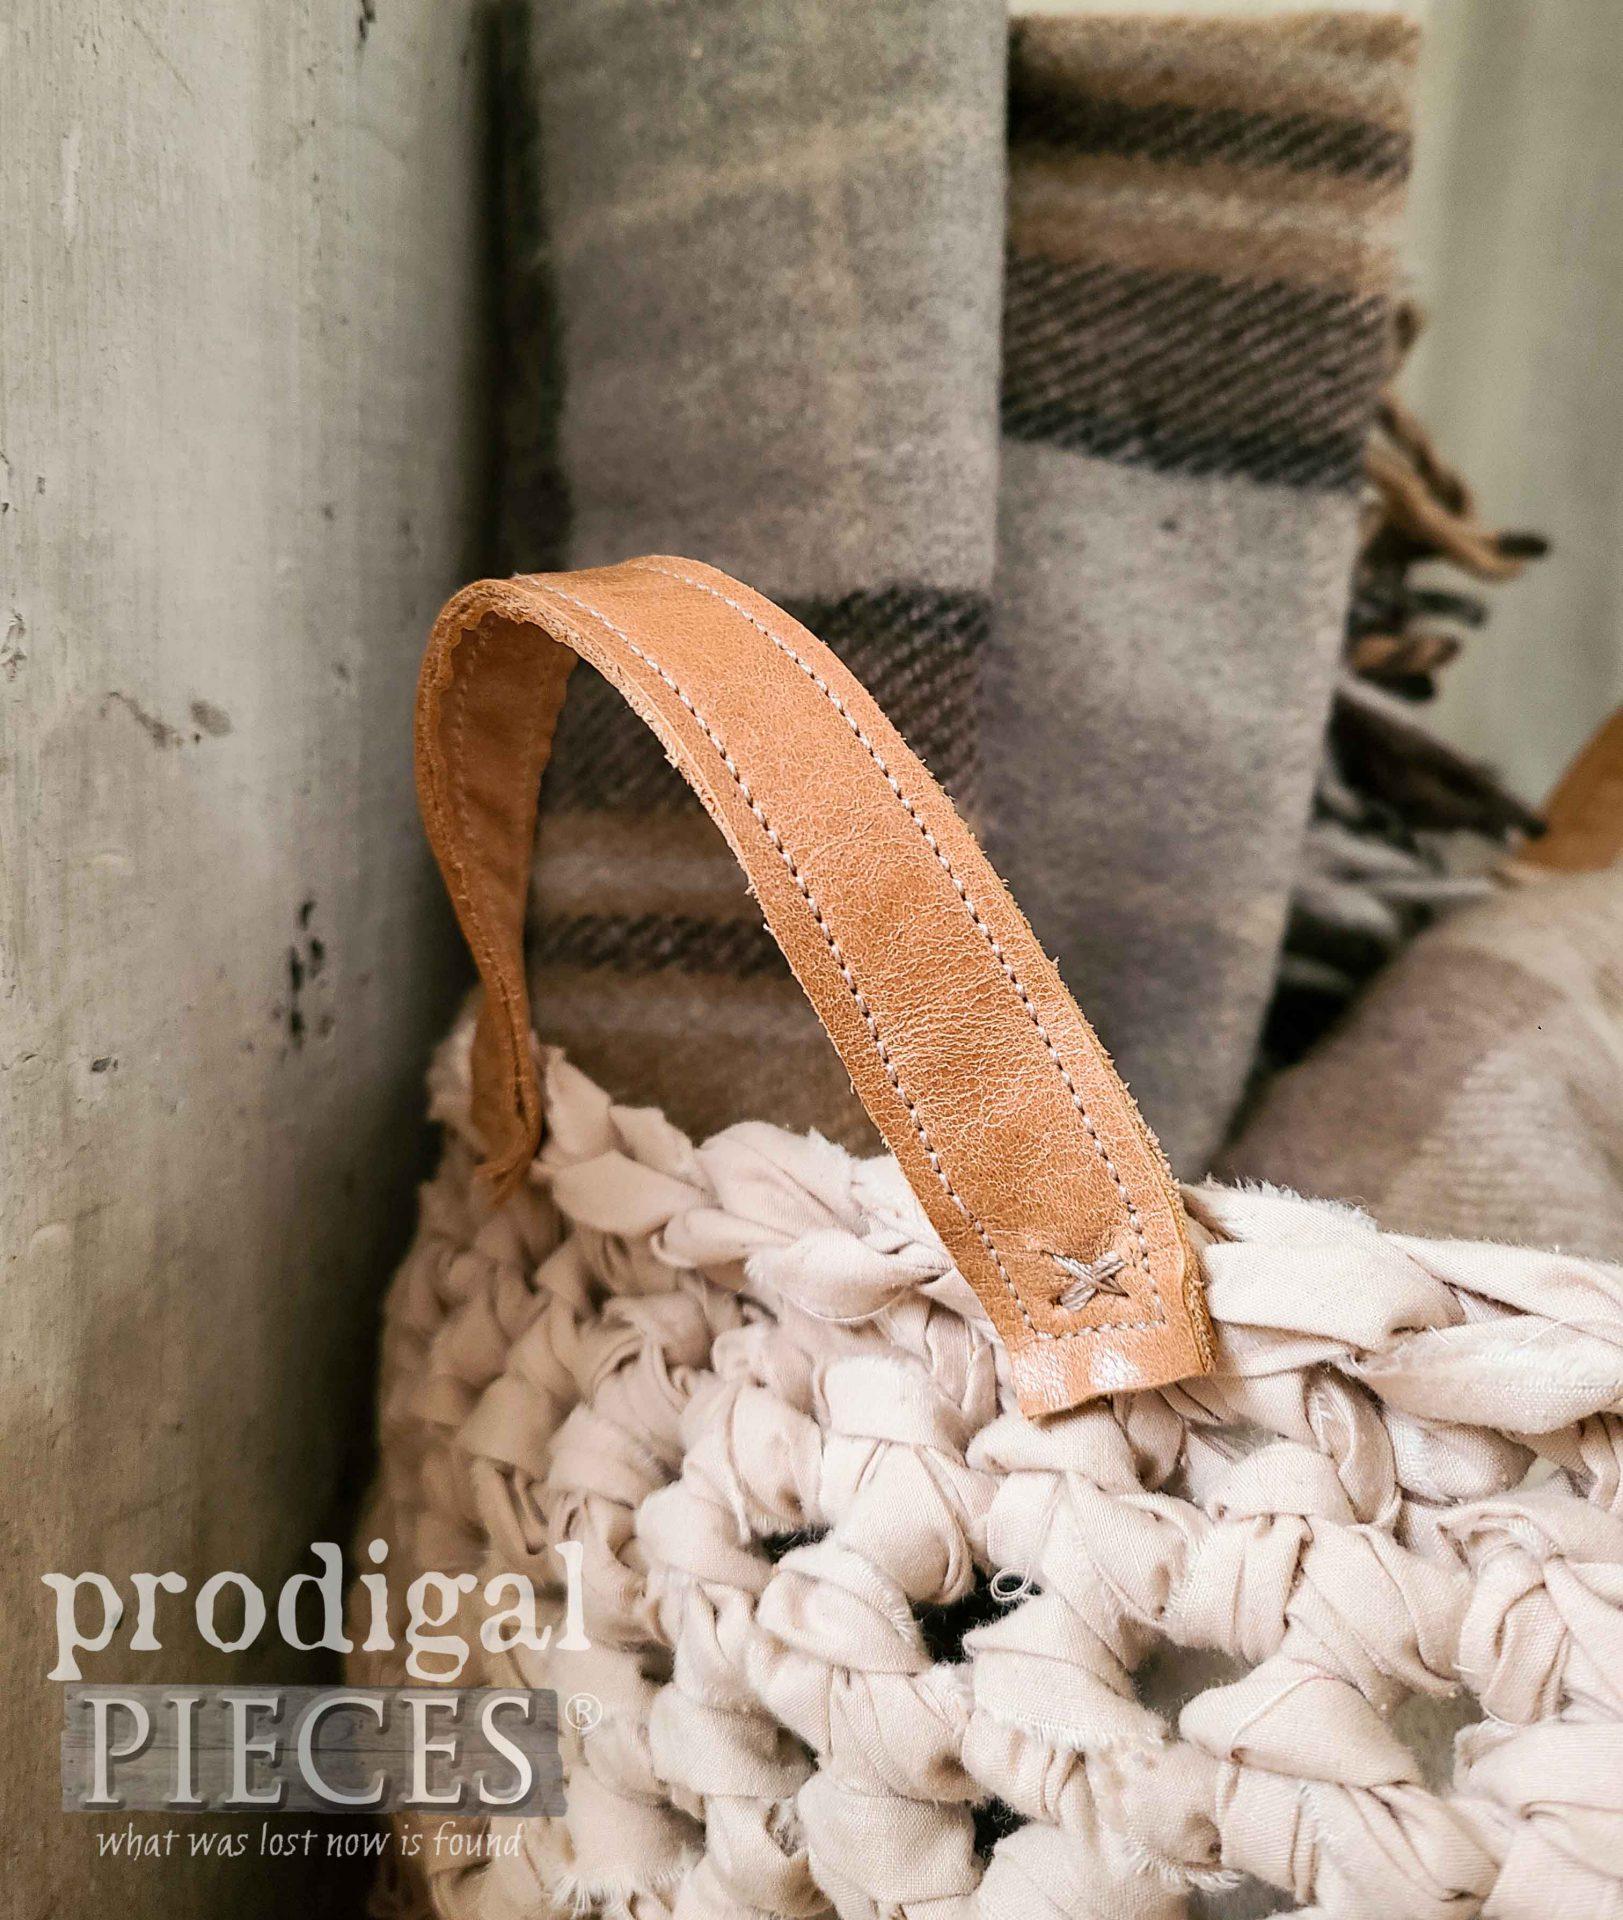 Leather Handles on Crochet Basket by Larissa of Prodigal Pieces | prodigalpieces.com #prodigalpieces #basket #diy #farmhouse #home